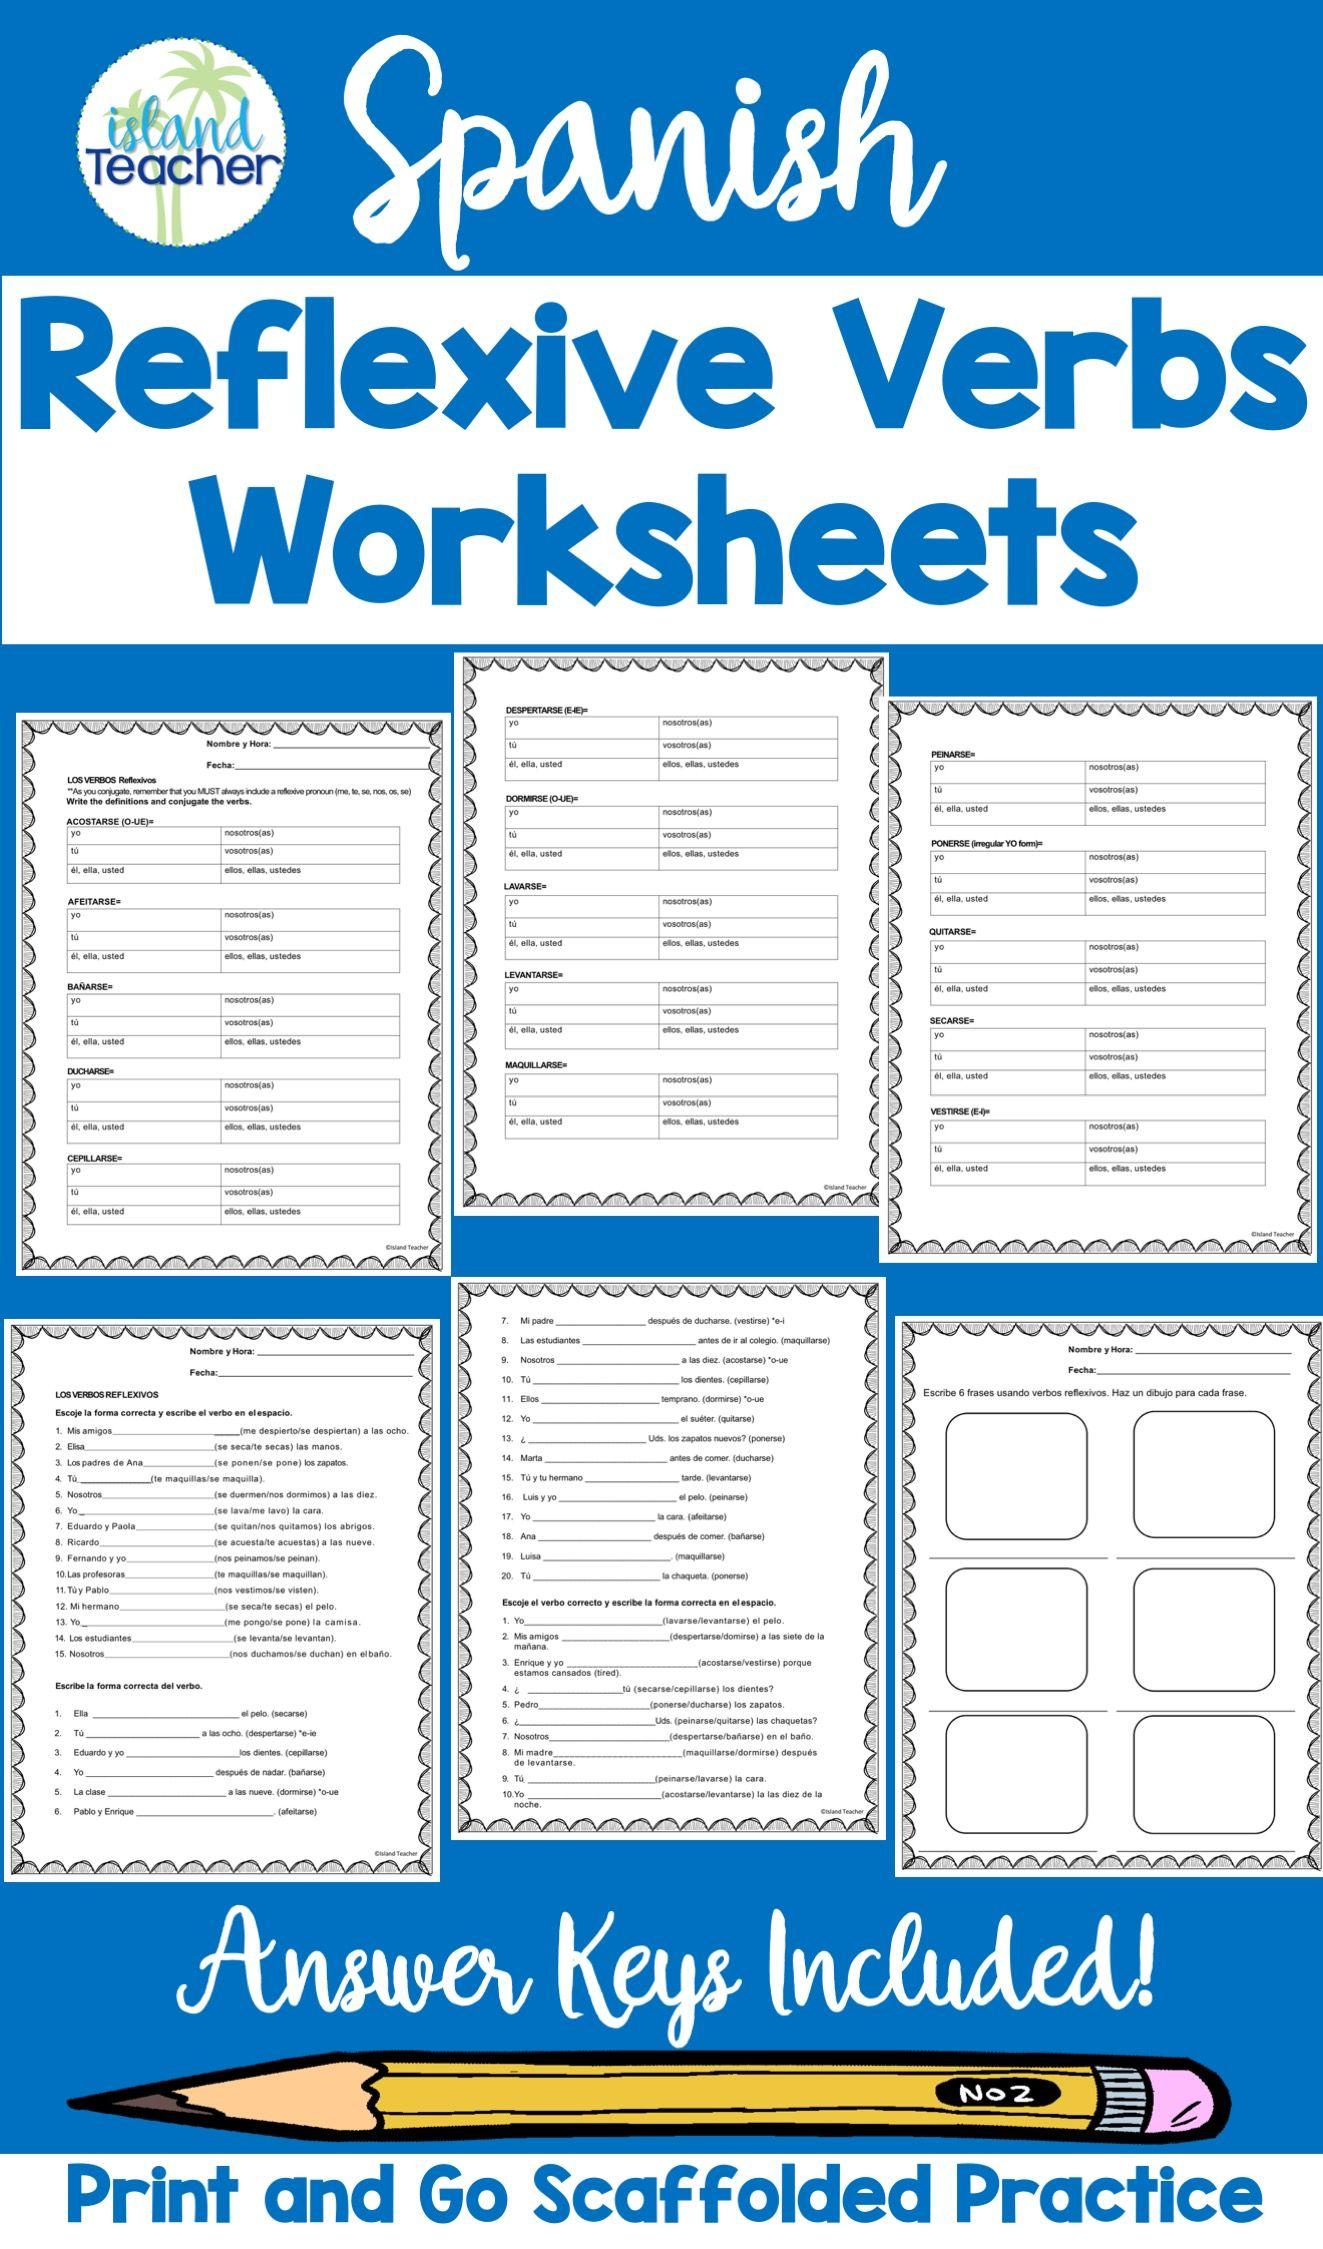 Spanish Reflexive Verbs Worksheets Practice Spanish Reflexive Verbs Reflexive Verbs Verb Worksheets